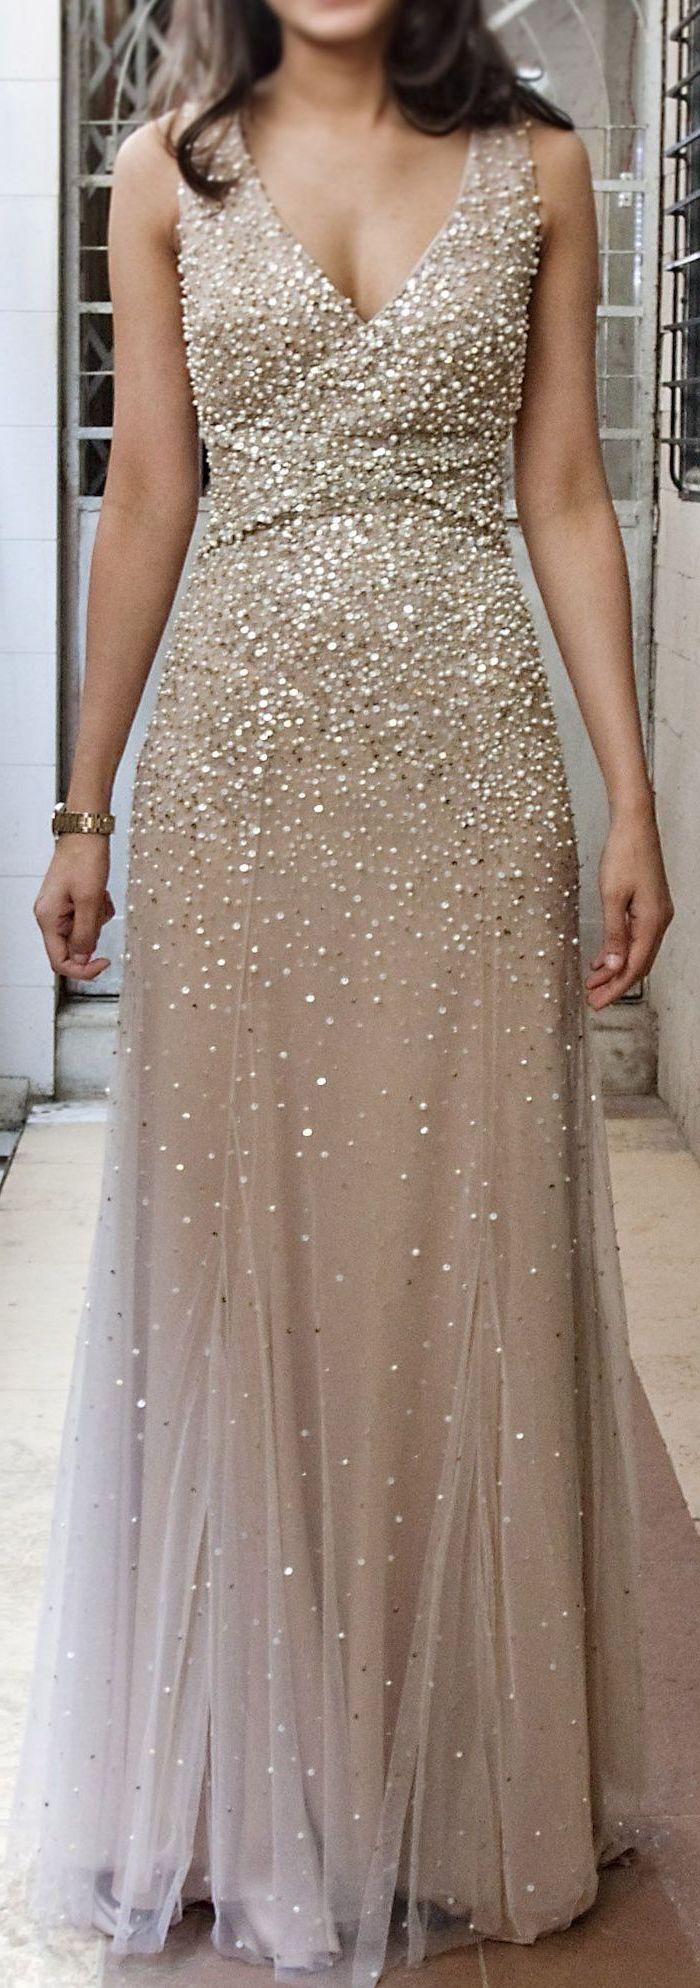 long dress, gold sequins, v neckline, sparkly bridesmaid dresses